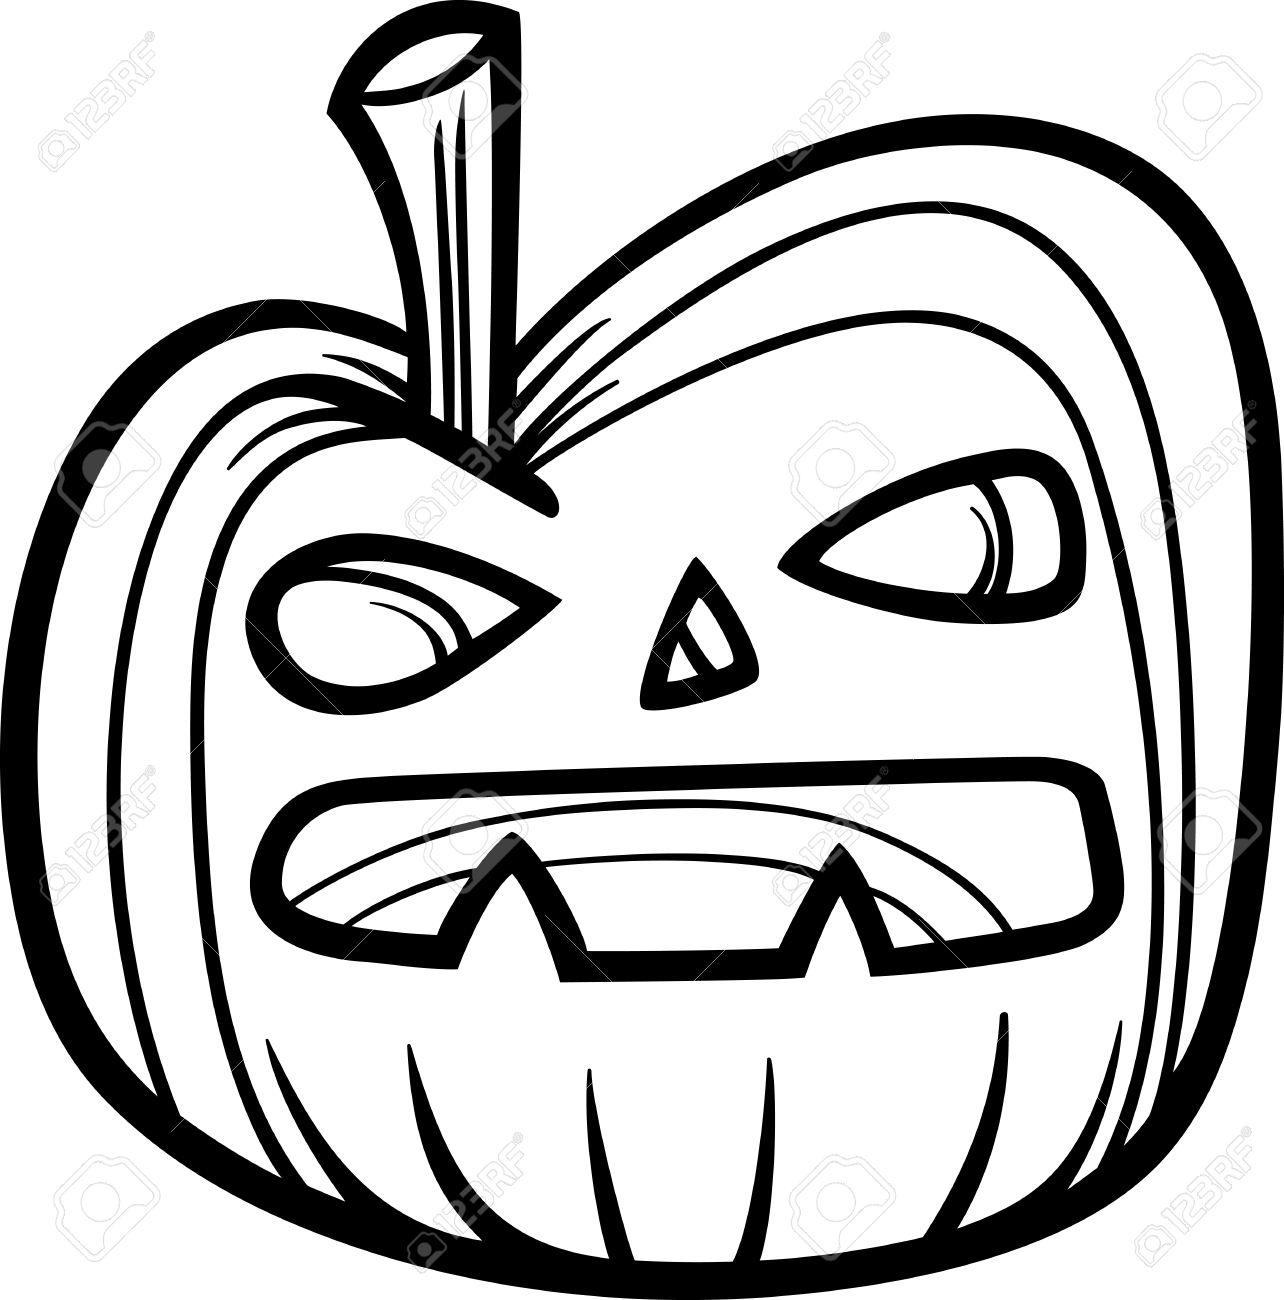 Pumpkin Cartoon Drawing At Getdrawings